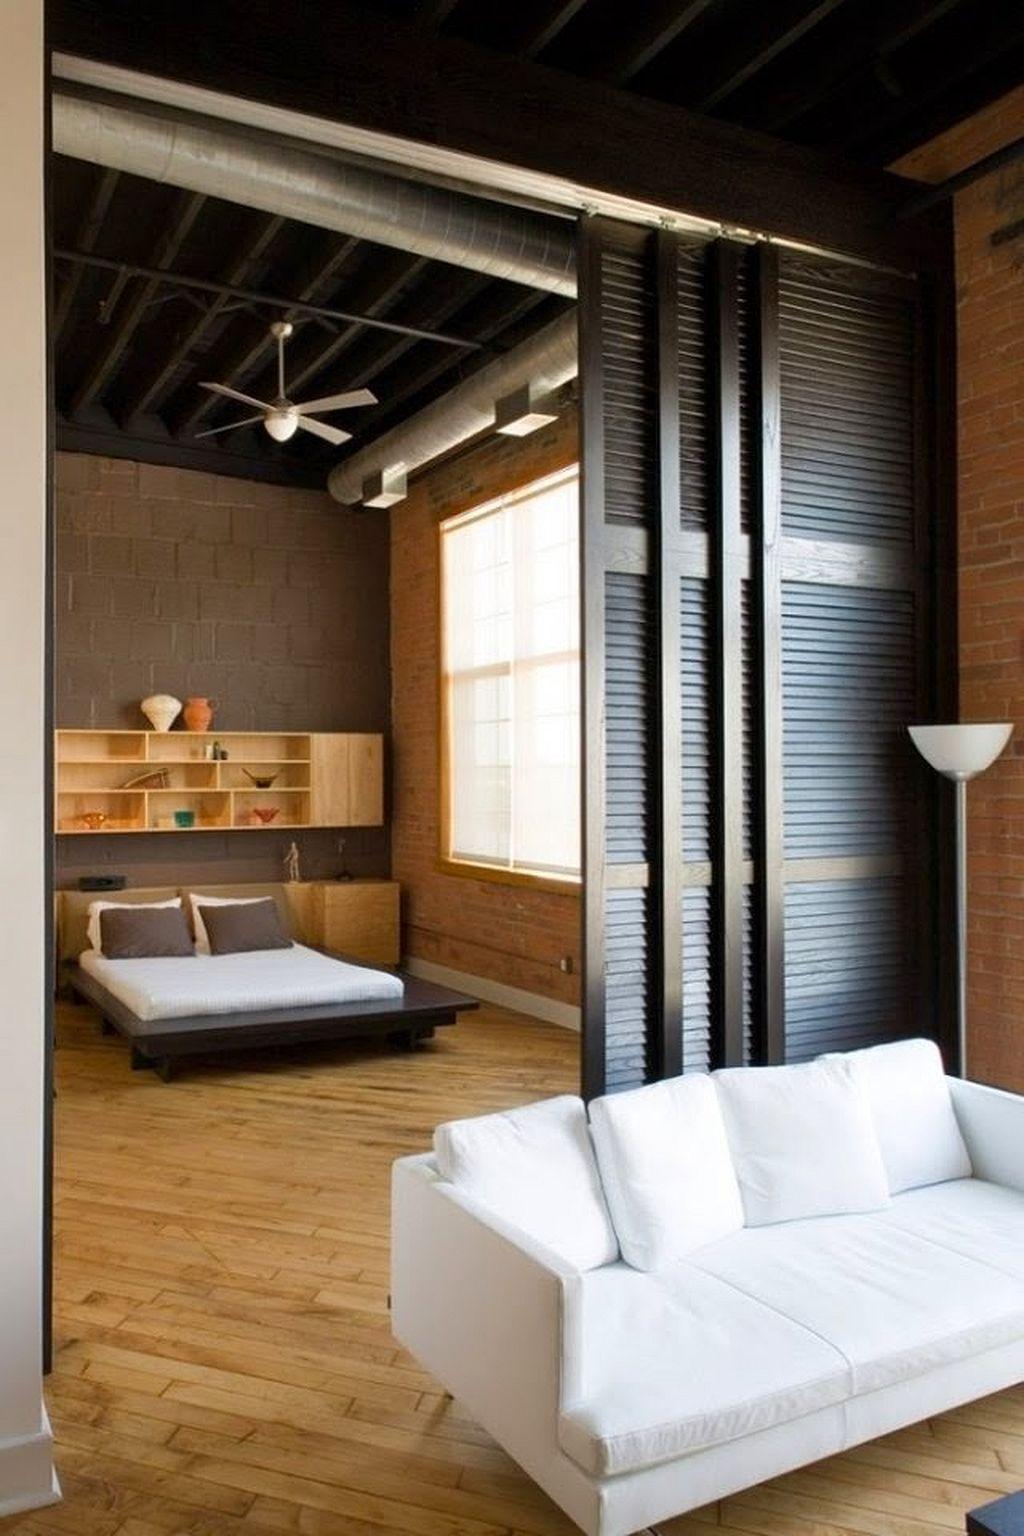 Gorgeous 50 Modern Studio Apartment Dividers Ideas Budget Friendly Https Hgmagz Com 50 Modern S Scheidingswand Boekenkast Slaapkamer Verbouwen Kleine Kamers